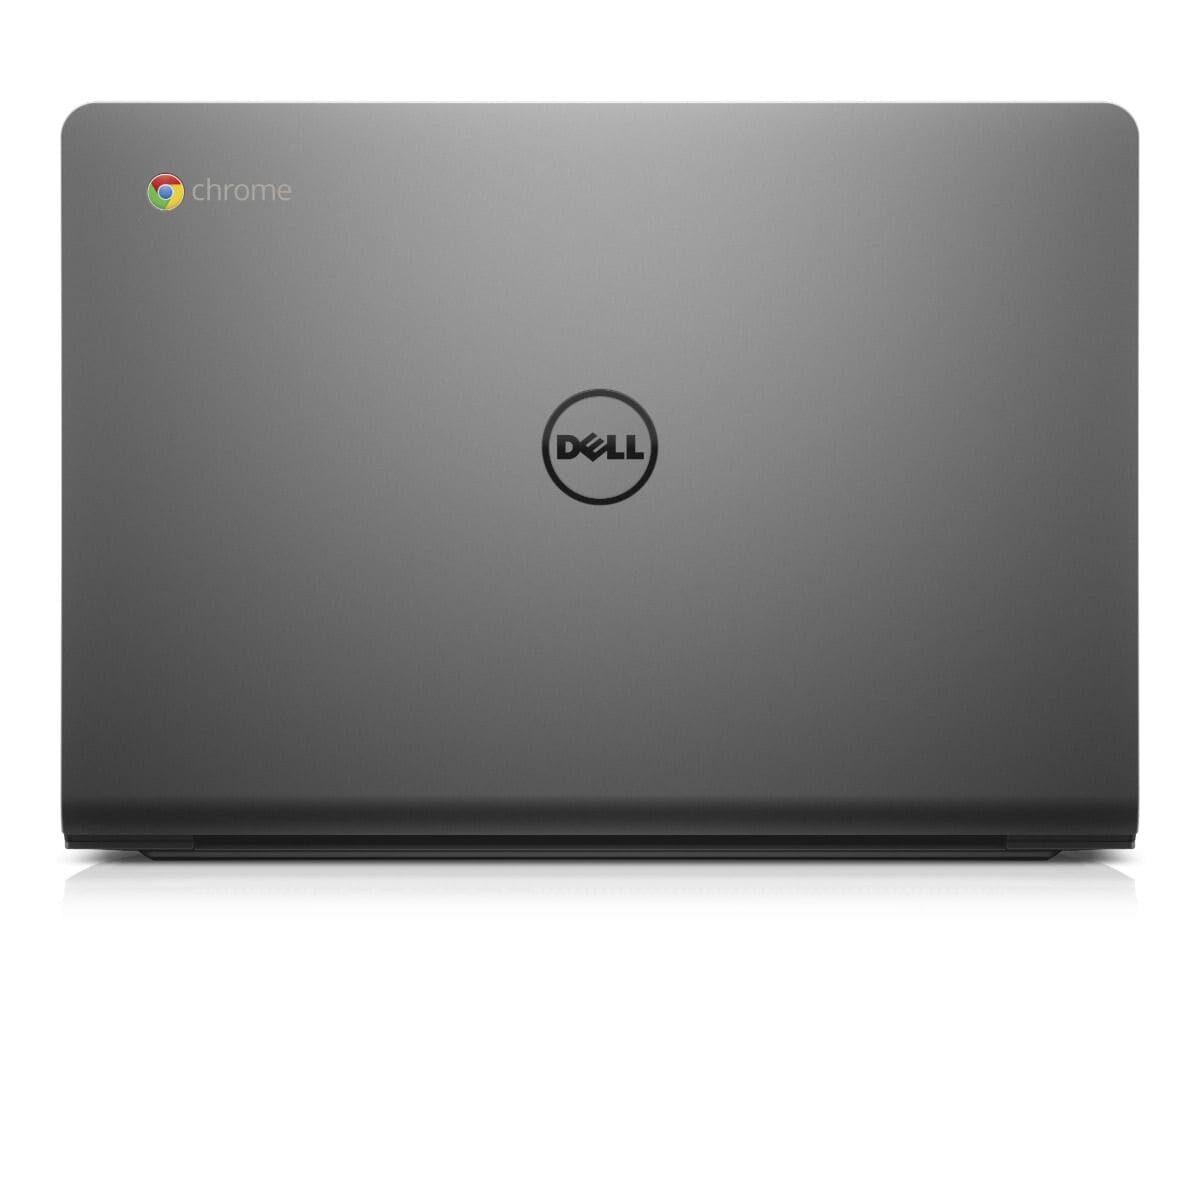 "Dell Chromebook Laptop Powerful 11.6"" 16GB 4GB Webcam HDMI Chrome OS Black"